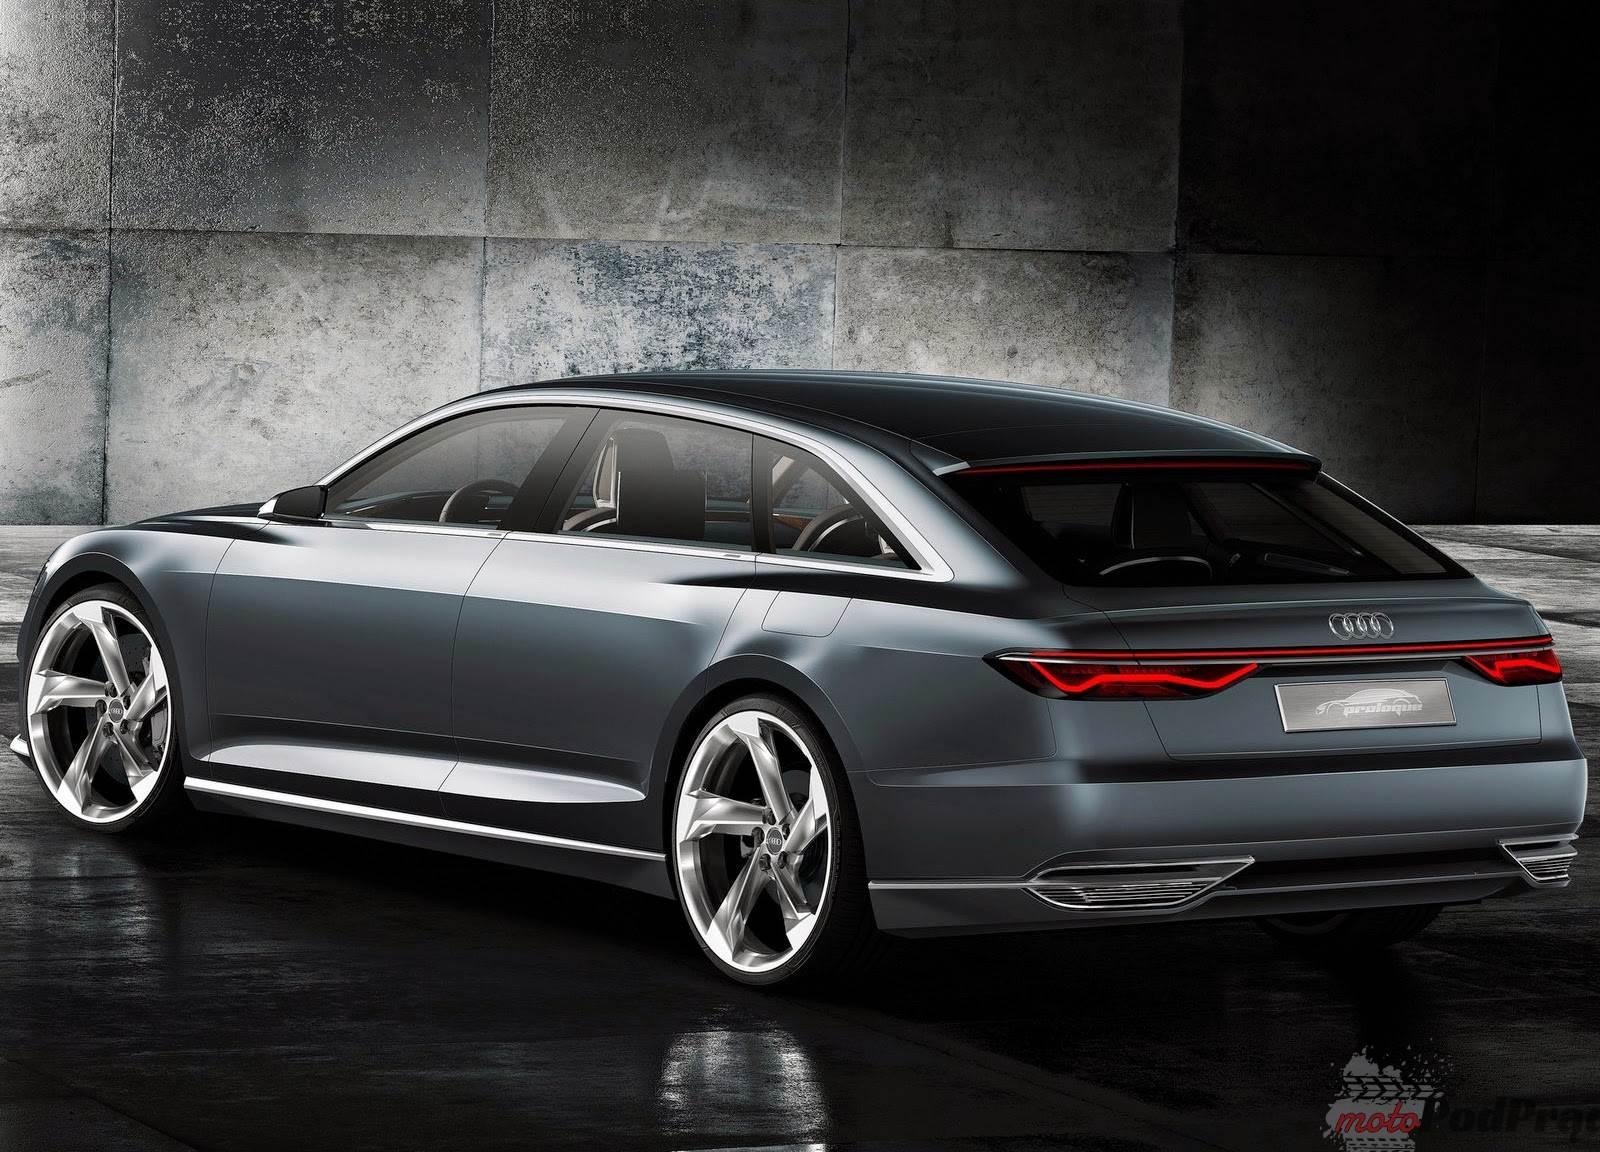 2015 Audi Prologue Avant Concept 2 Prototyp Audi A9? I to jeszcze w kombi?